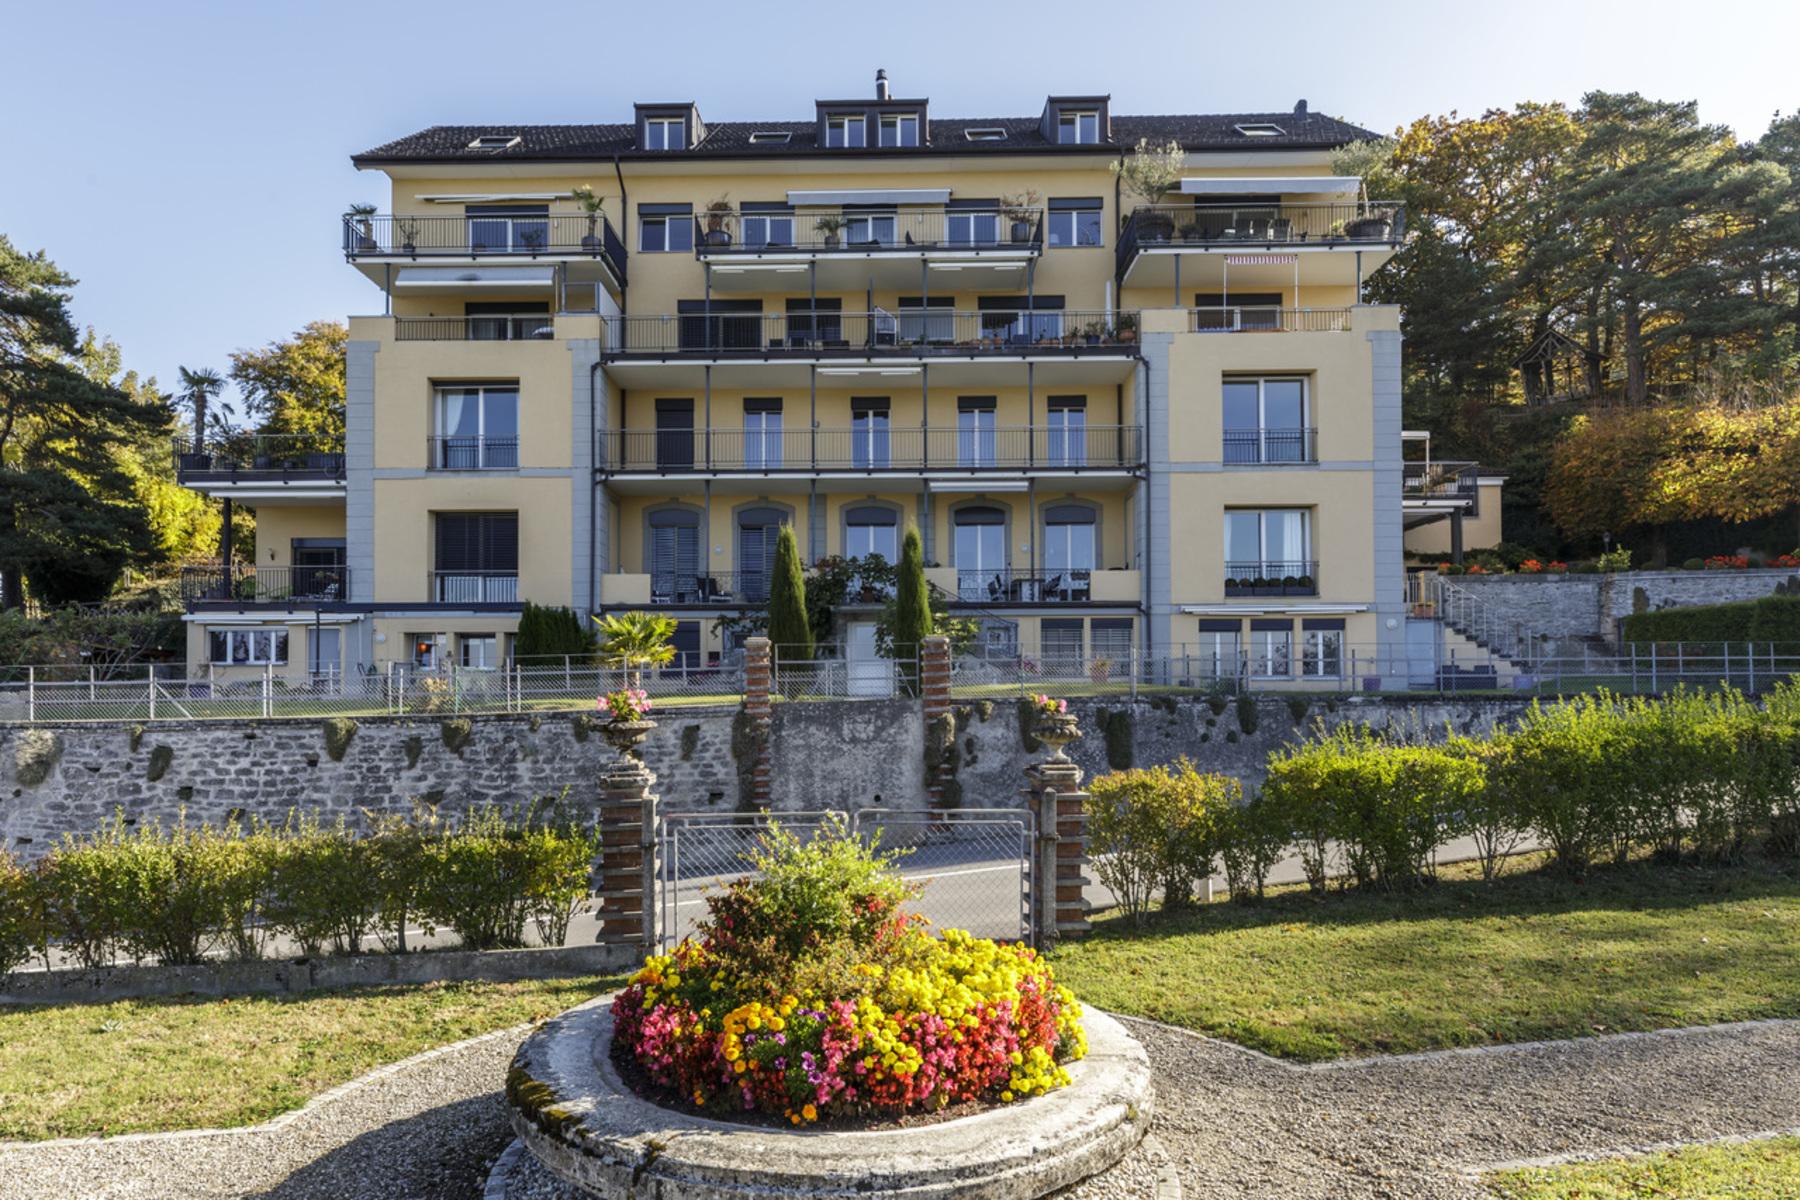 Duplex للـ Sale في Comfortable 4.5 room duplex benefiting from a splendid view Châbles, Other Switzerland, Other Areas In Switzerland, 1474 Switzerland